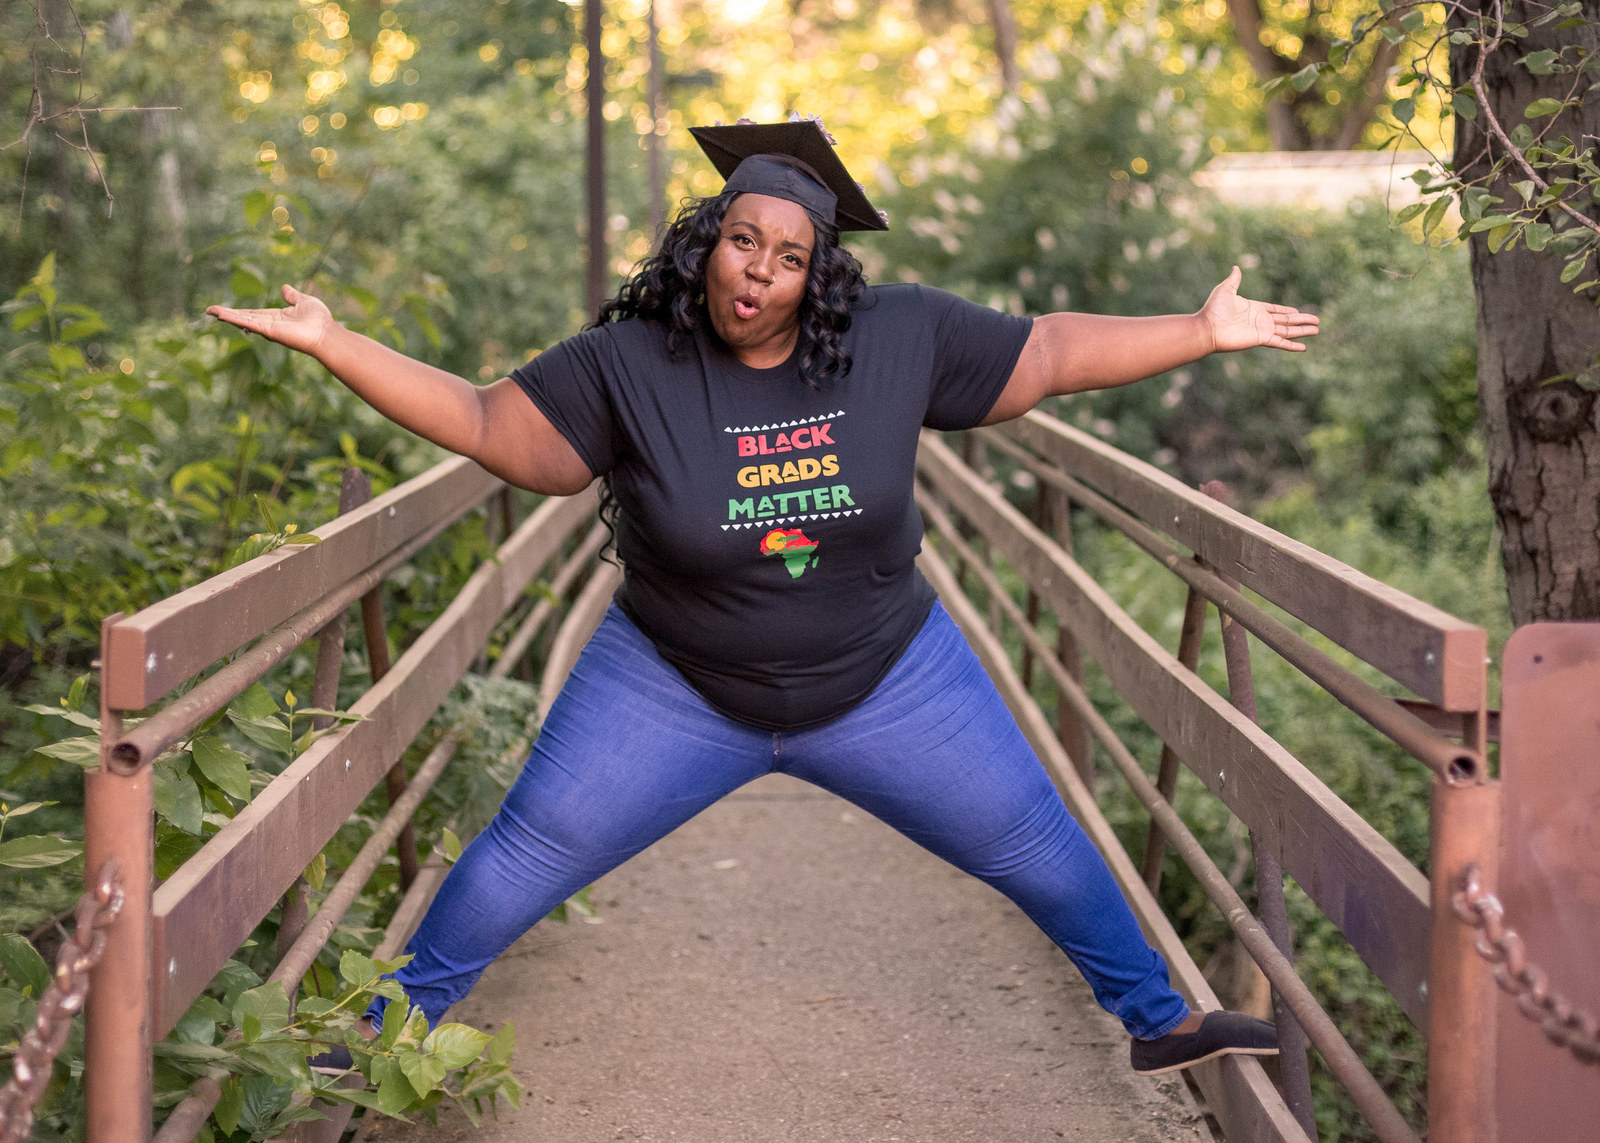 19 Stunning Photos Of Black Graduates Celebrating Their 2018 Graduation